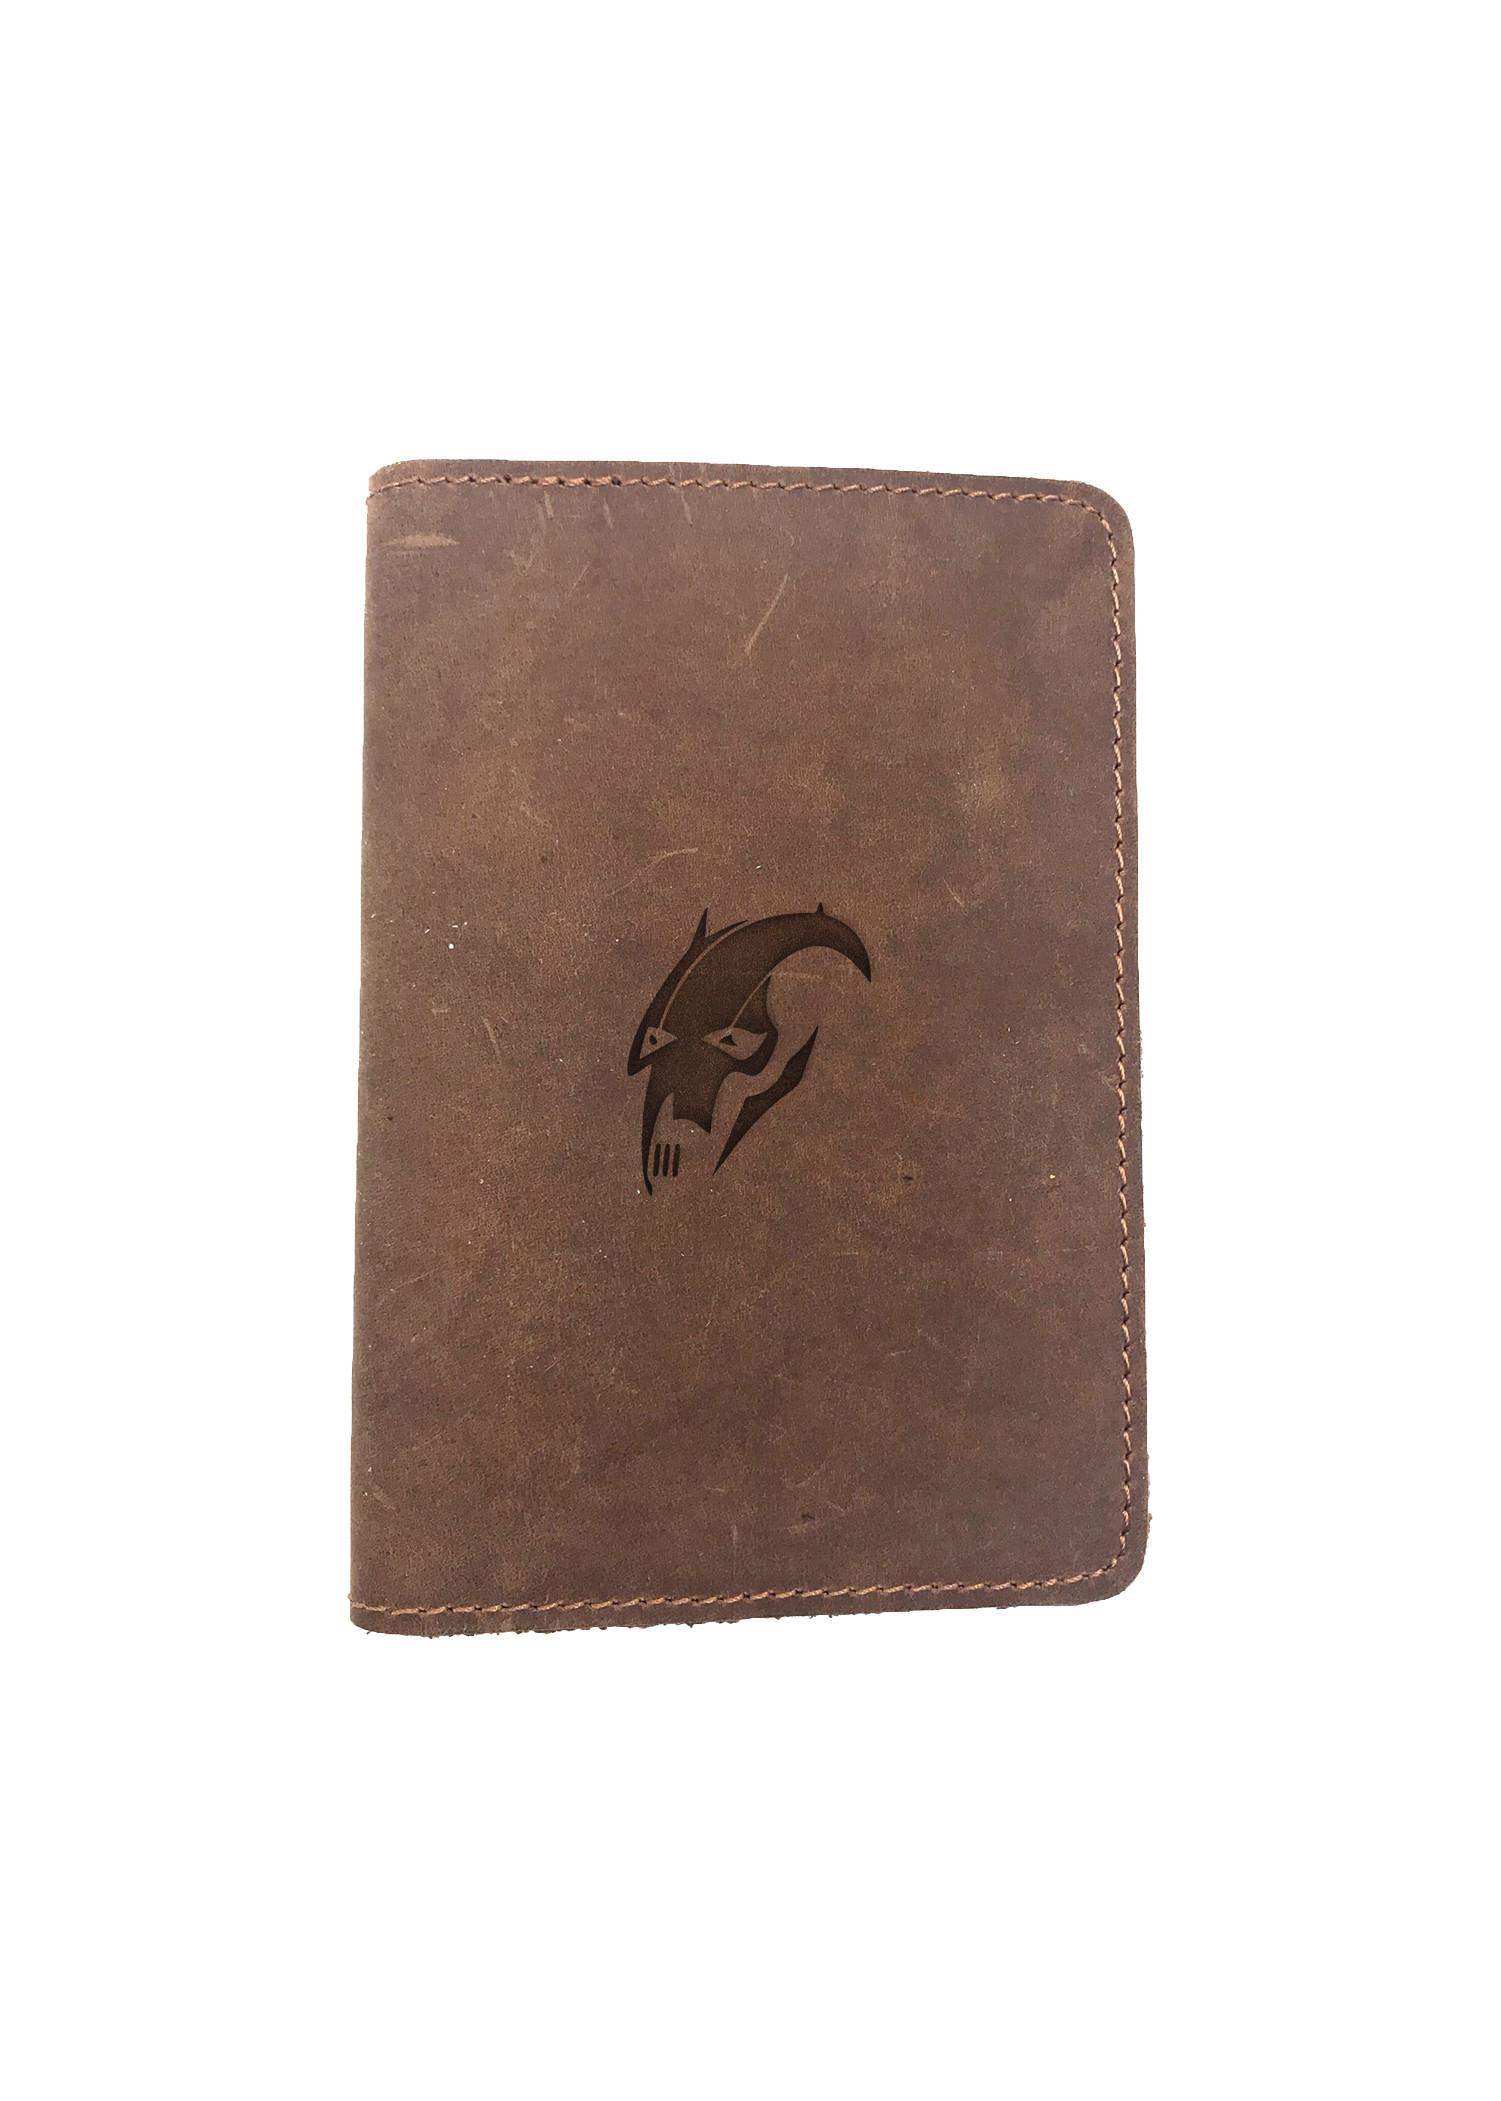 Passport Cover Bao Da Hộ Chiếu Da Sáp Khắc Hình Kí hiệu GENERAL GREVOZ STAR WARS (BROWN)